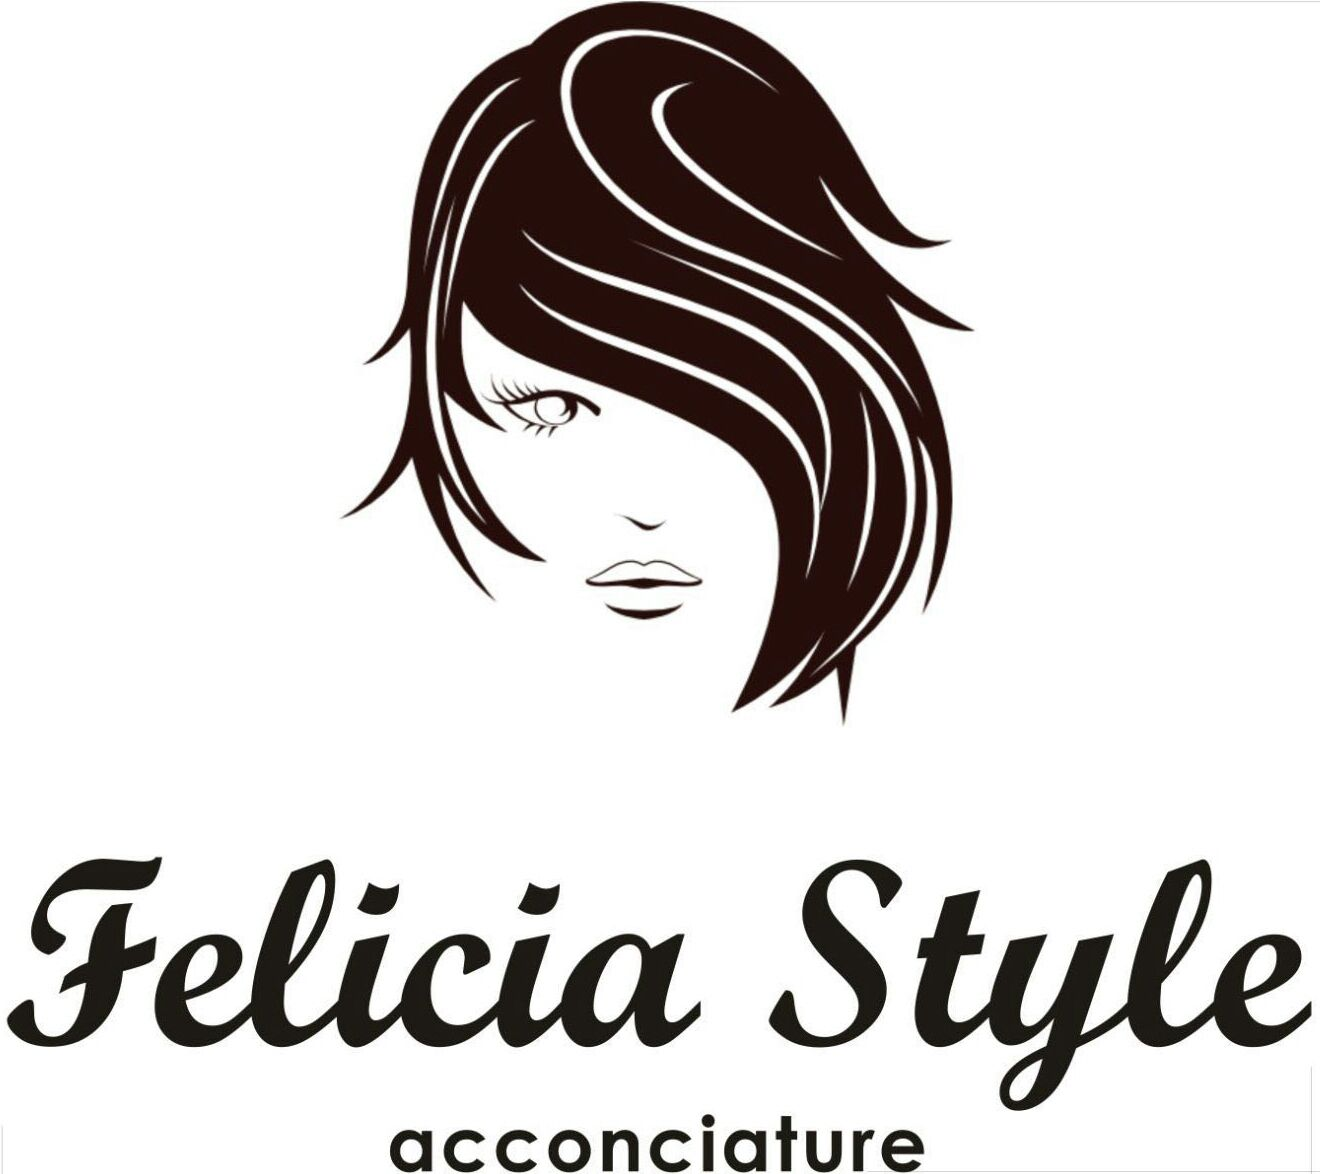 Felicia style acconciature